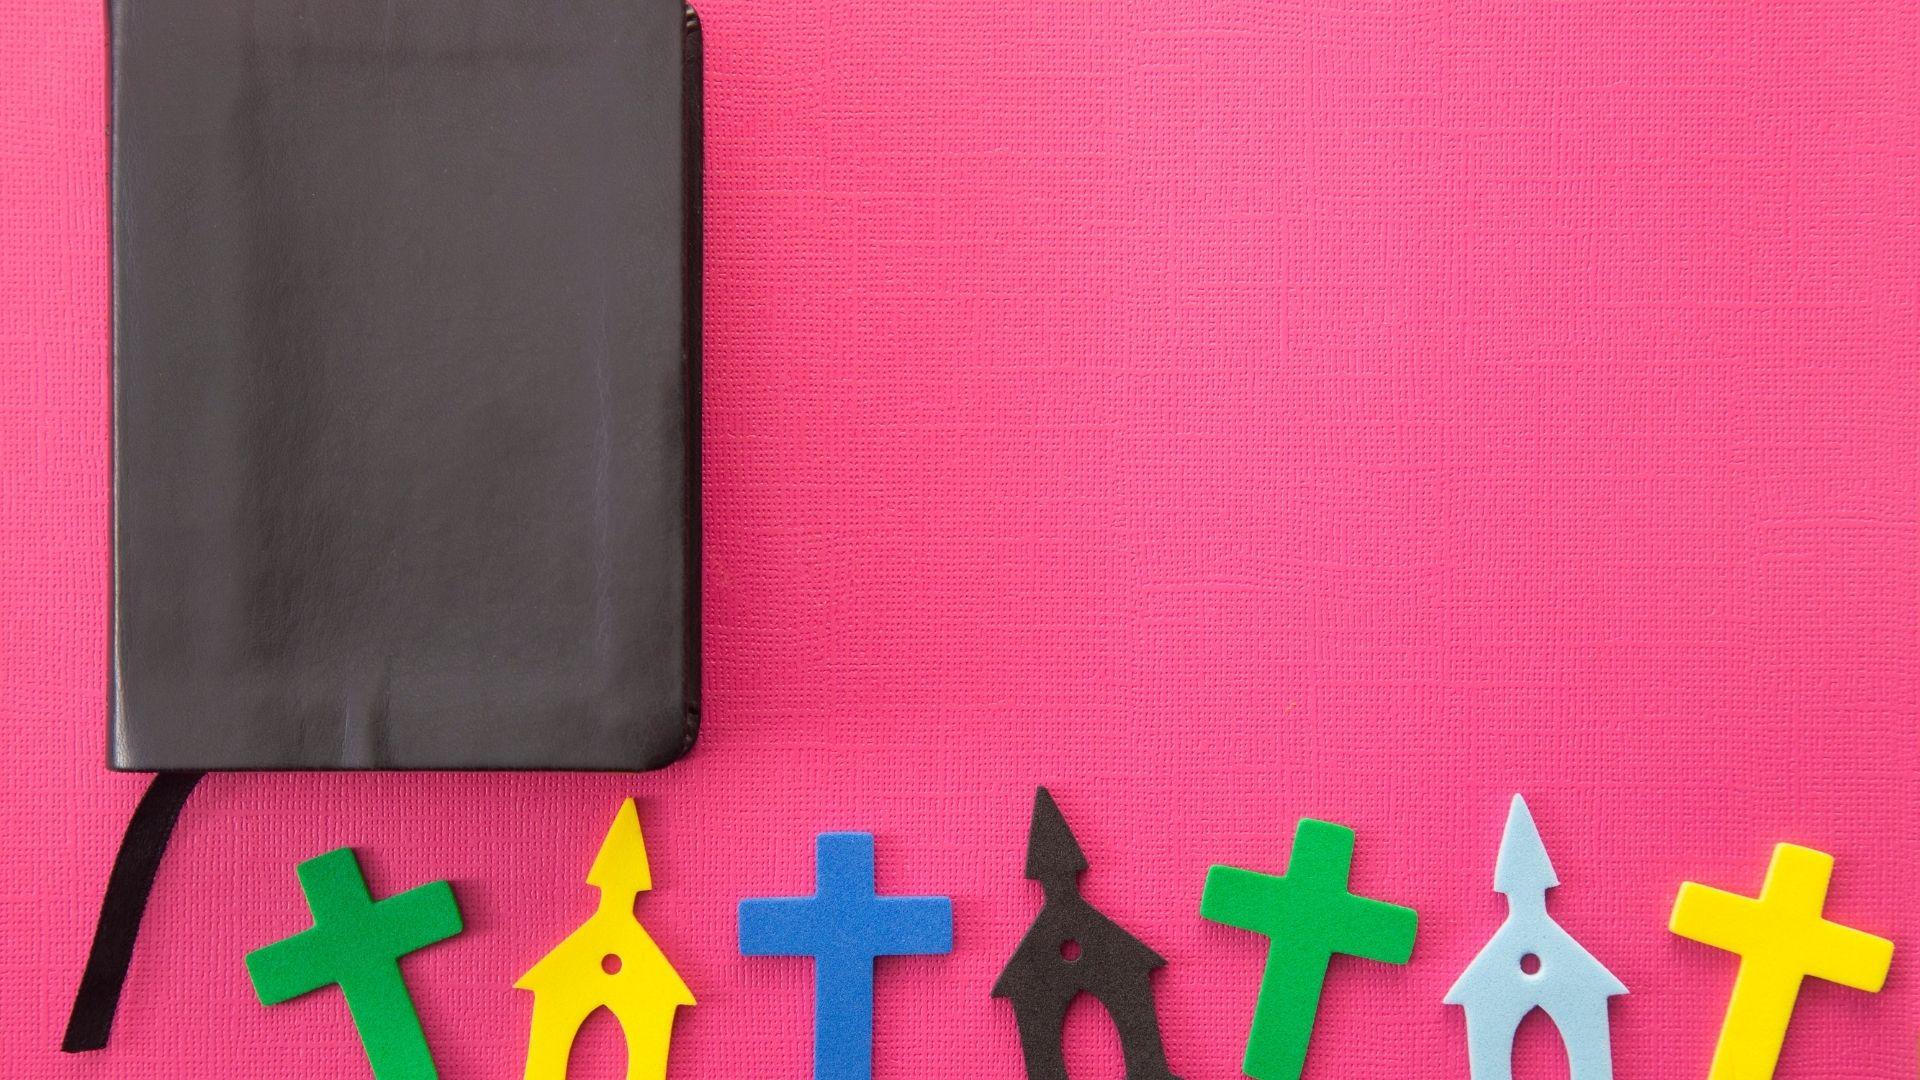 210117-gtj-webb-kompis bibel kors kyrka rosa